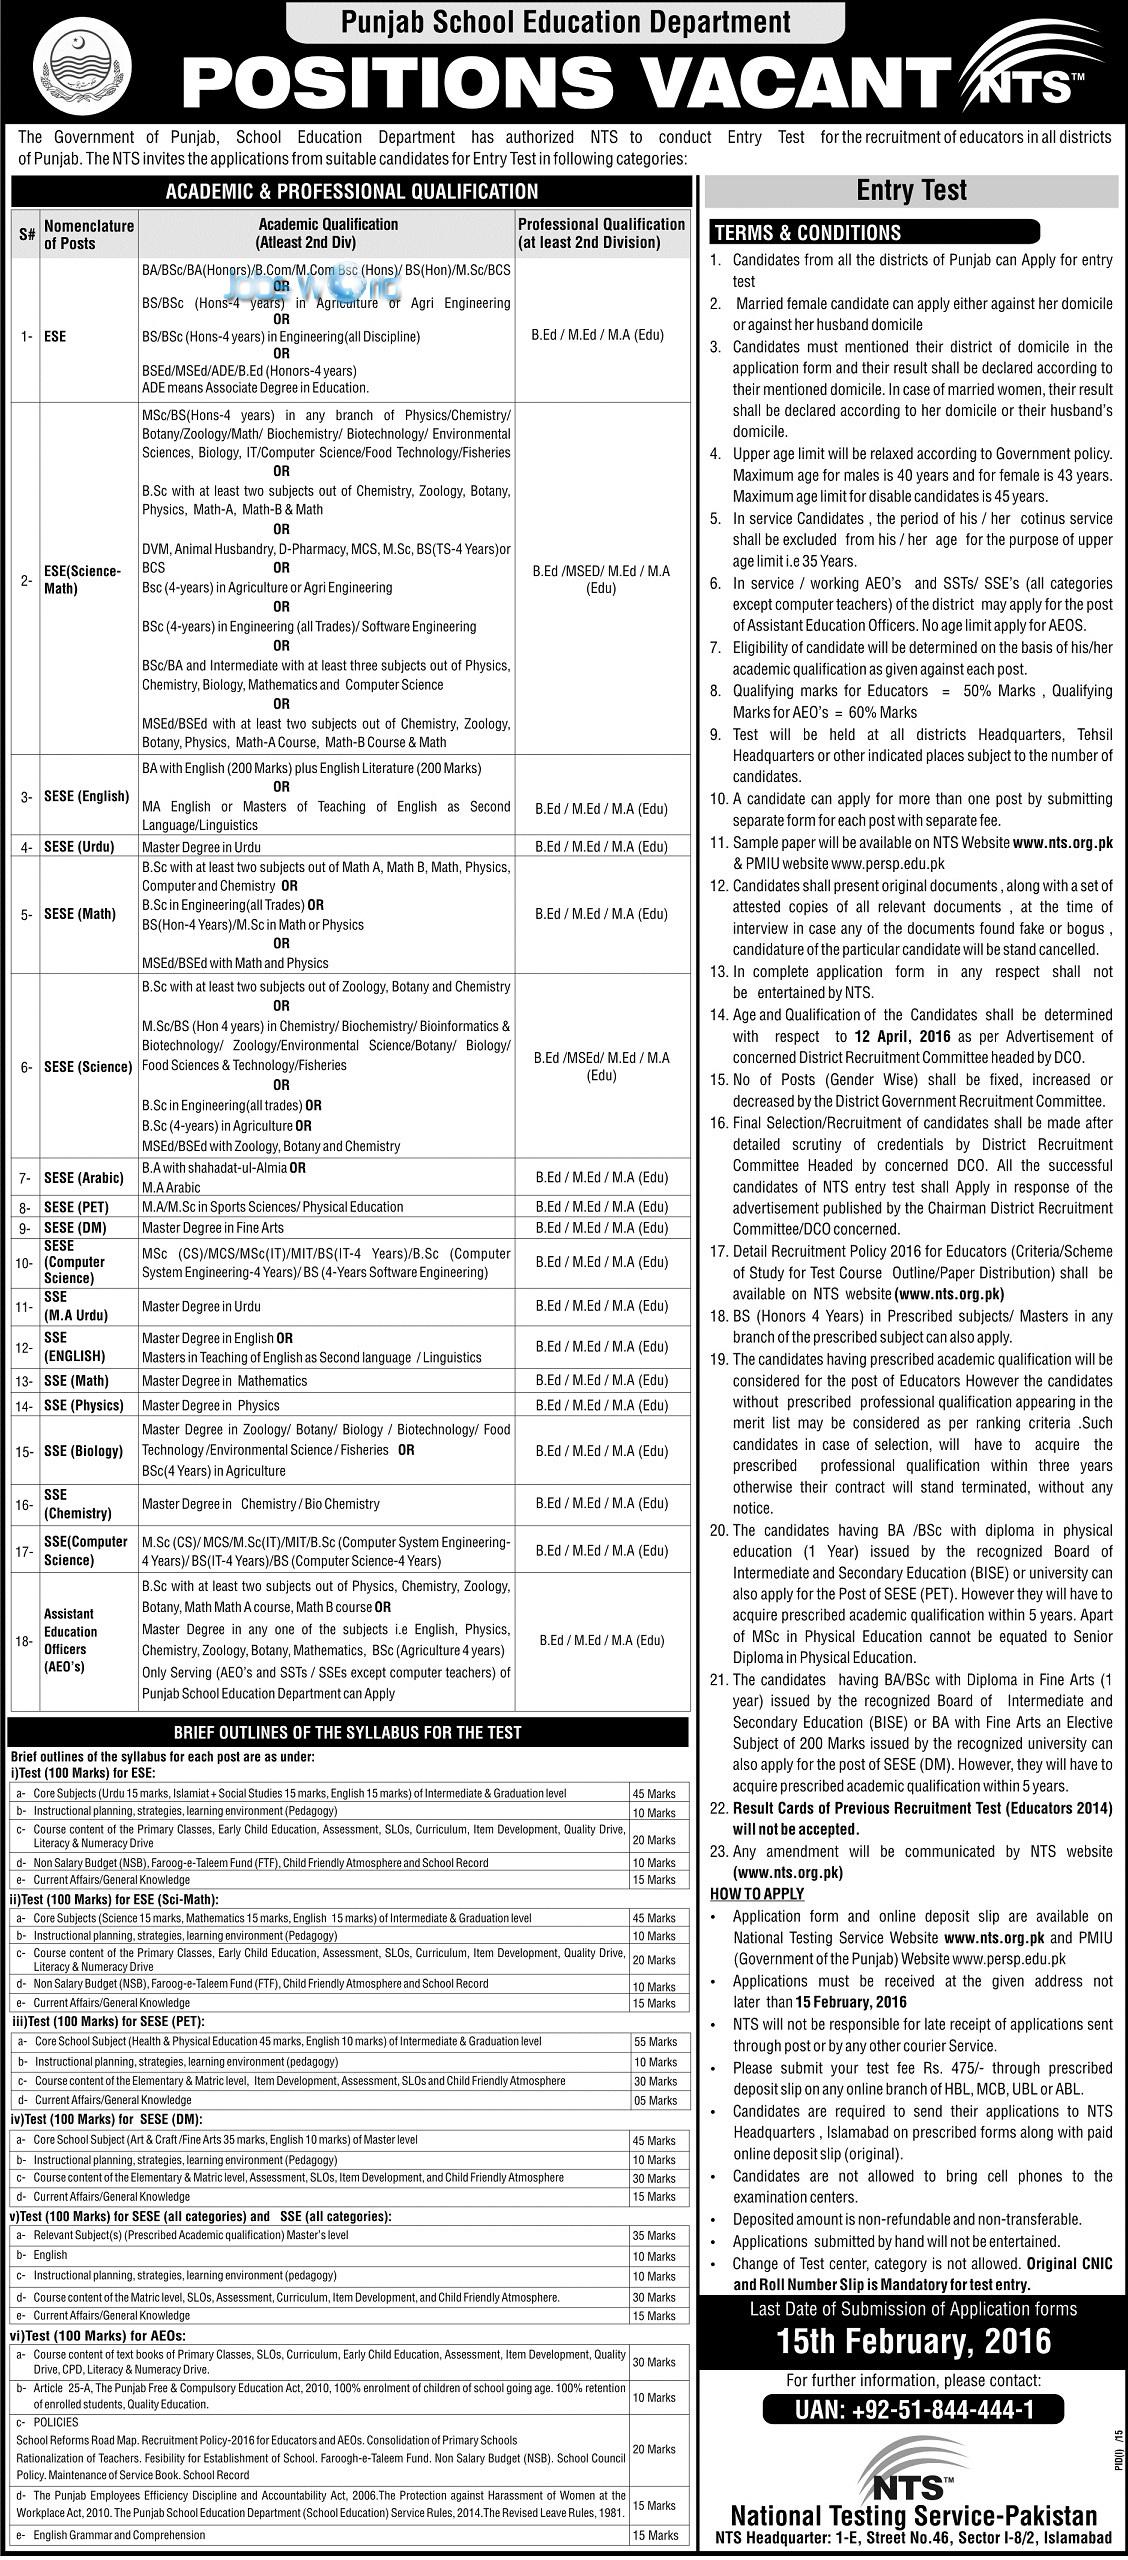 punjab educators teachers jobs eligibility criteria jobsworld